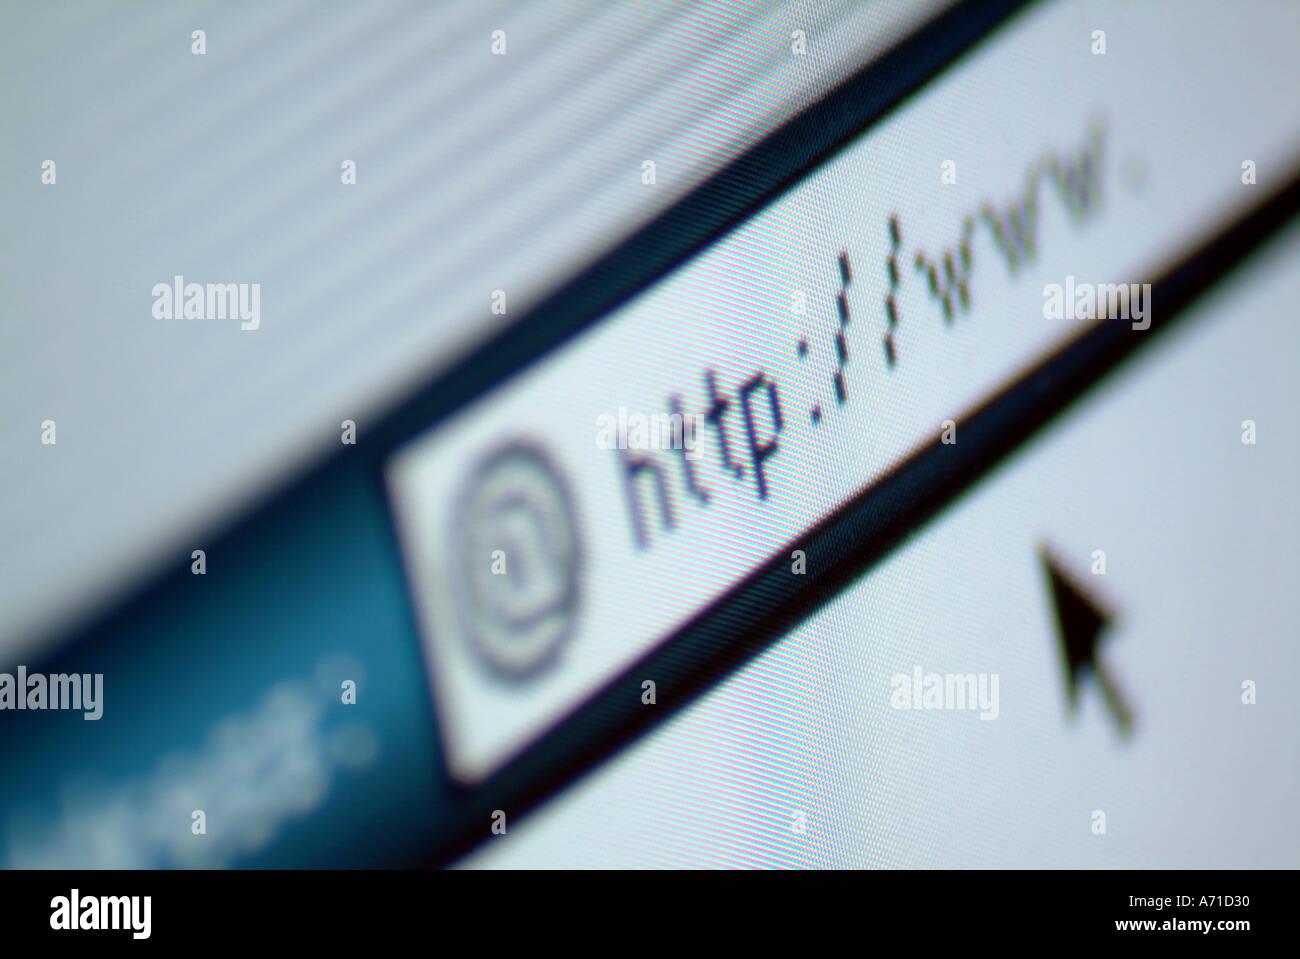 www written in address bar on a computer screen - Stock Image